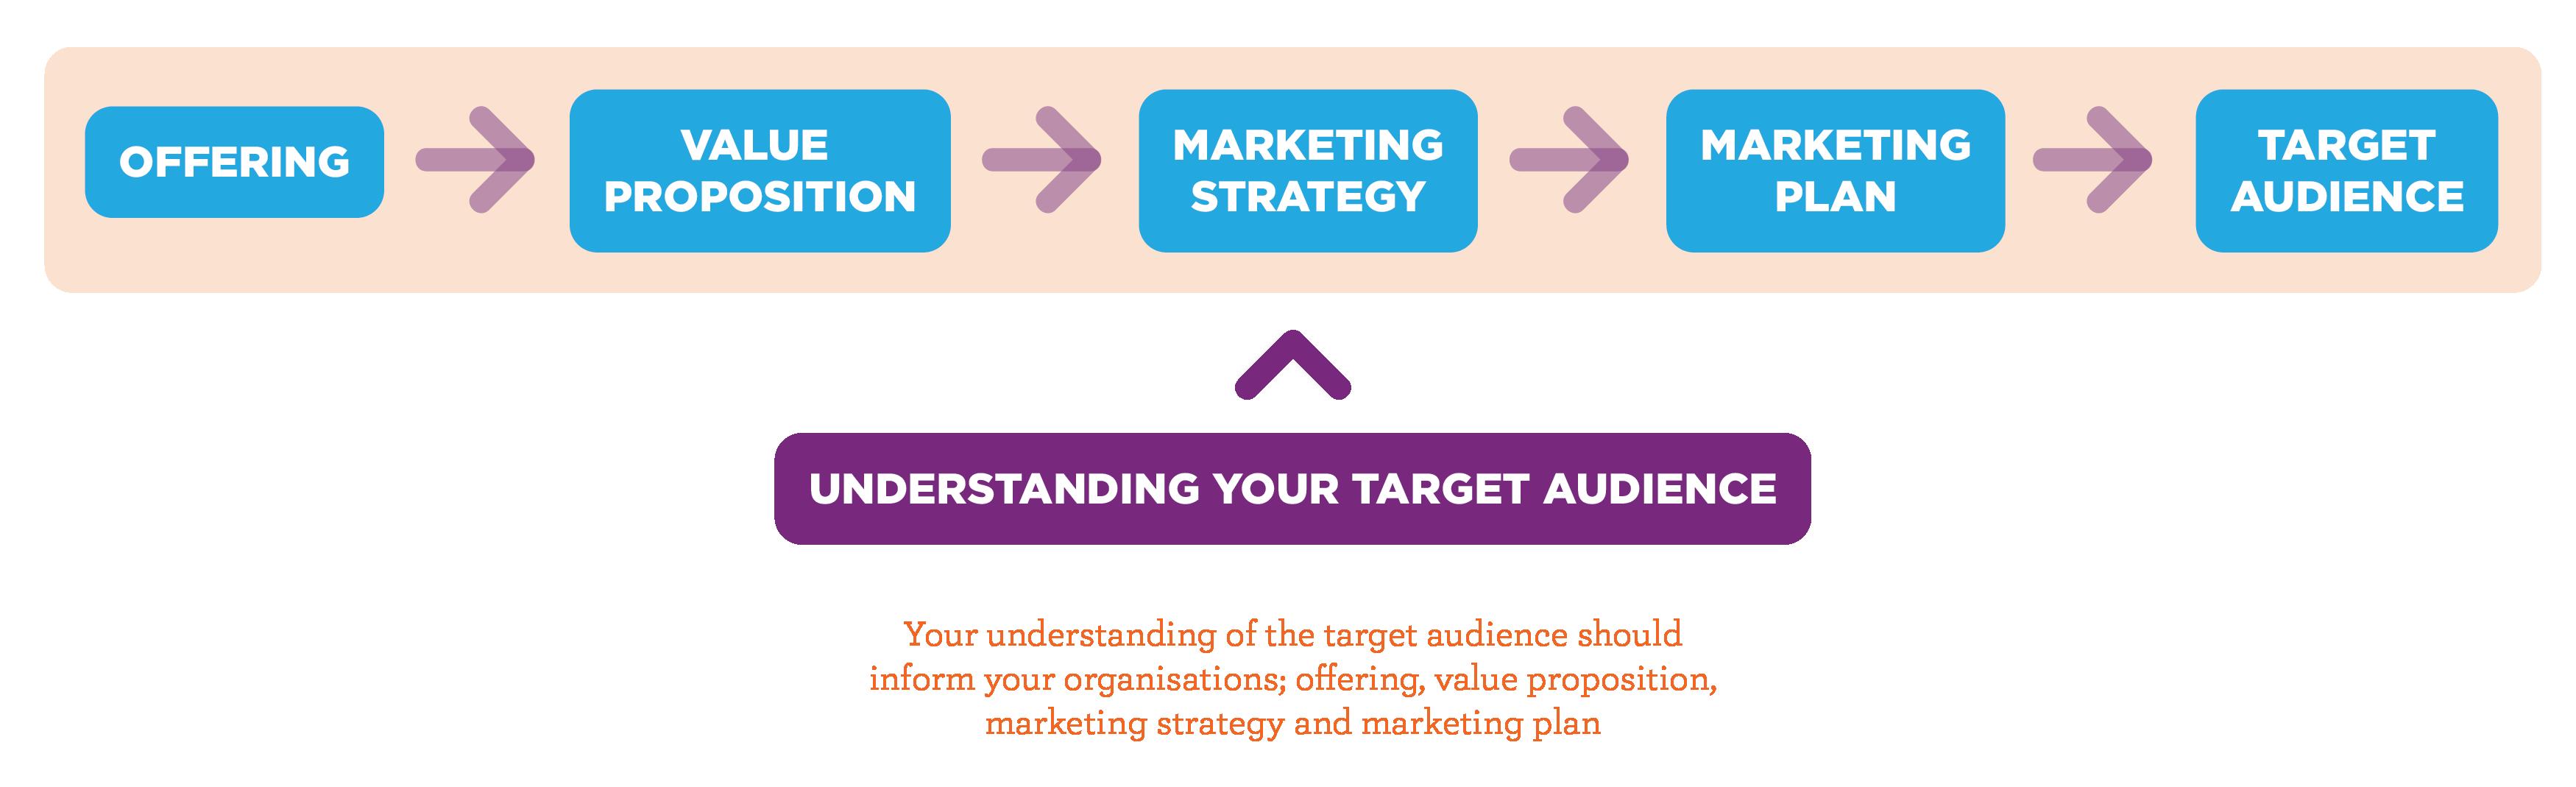 unltd - understanding your target audience | value proposition